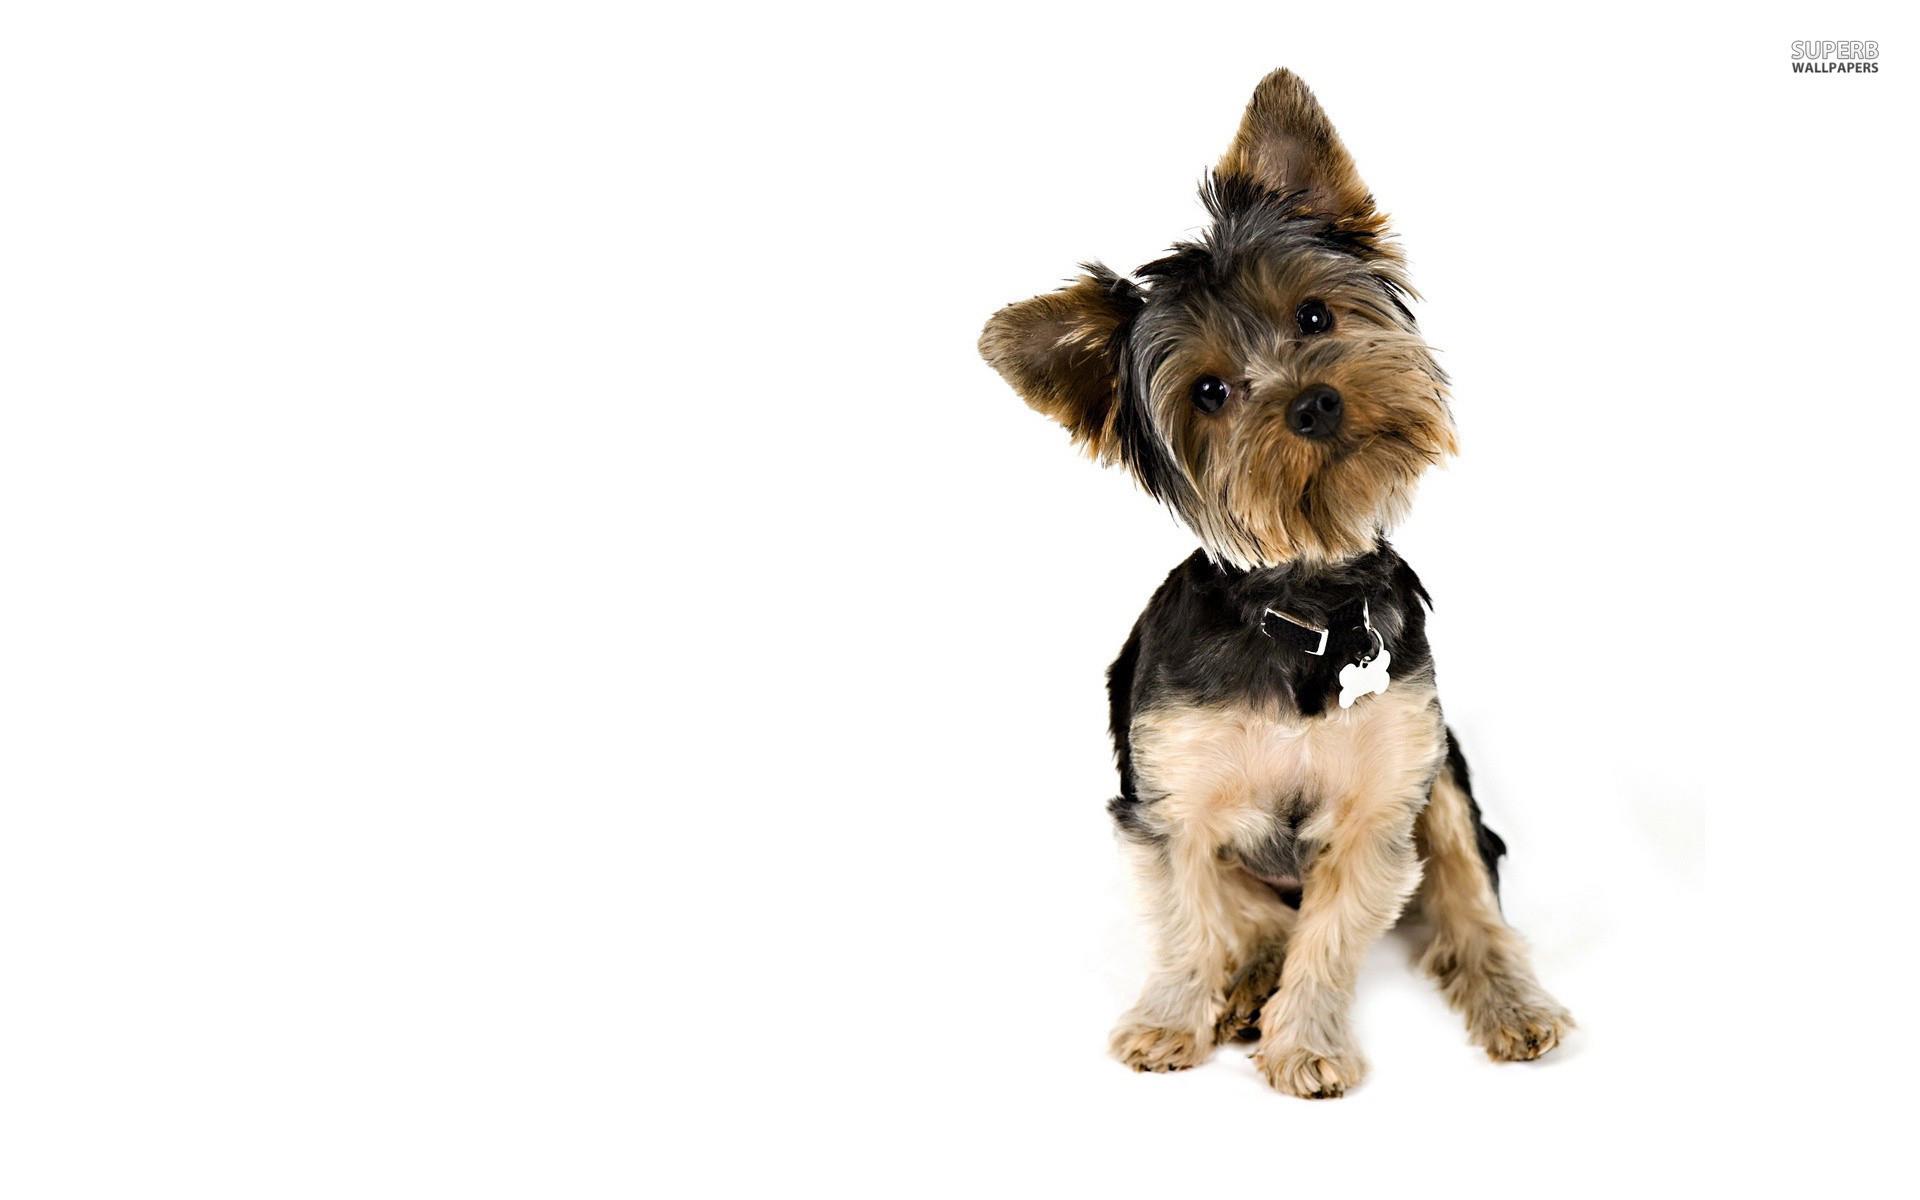 Yorkshire Terrier hd